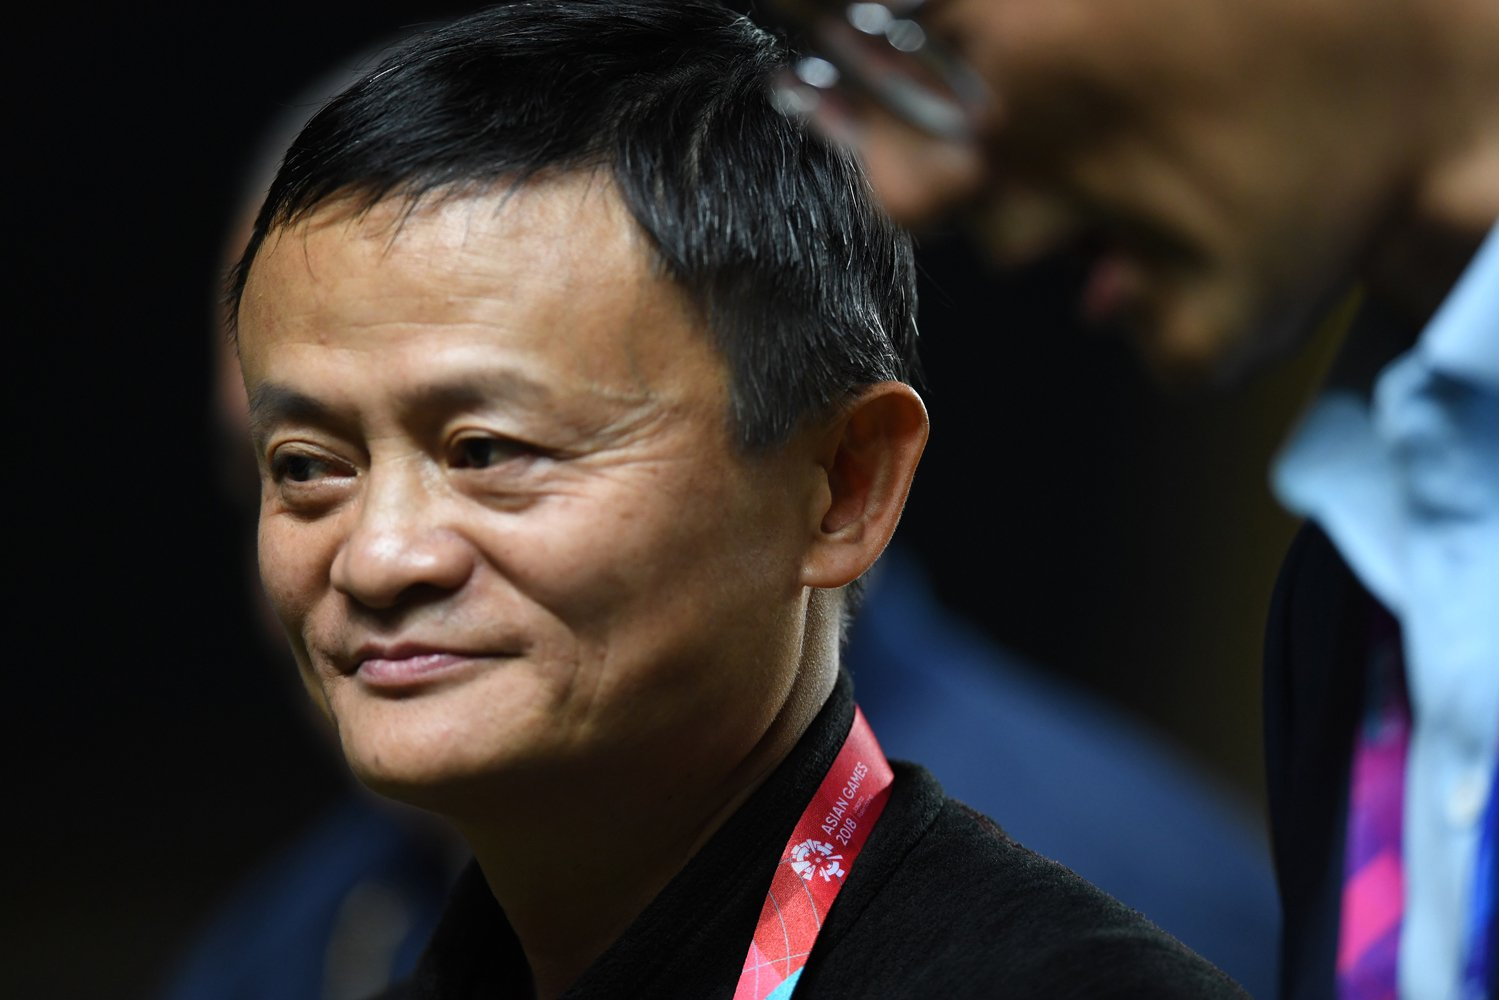 Jack Ma tercatat oleh Forbes memiliki total kekayaan US$ 38,7 miliar atau setara Rp 570 triliun.